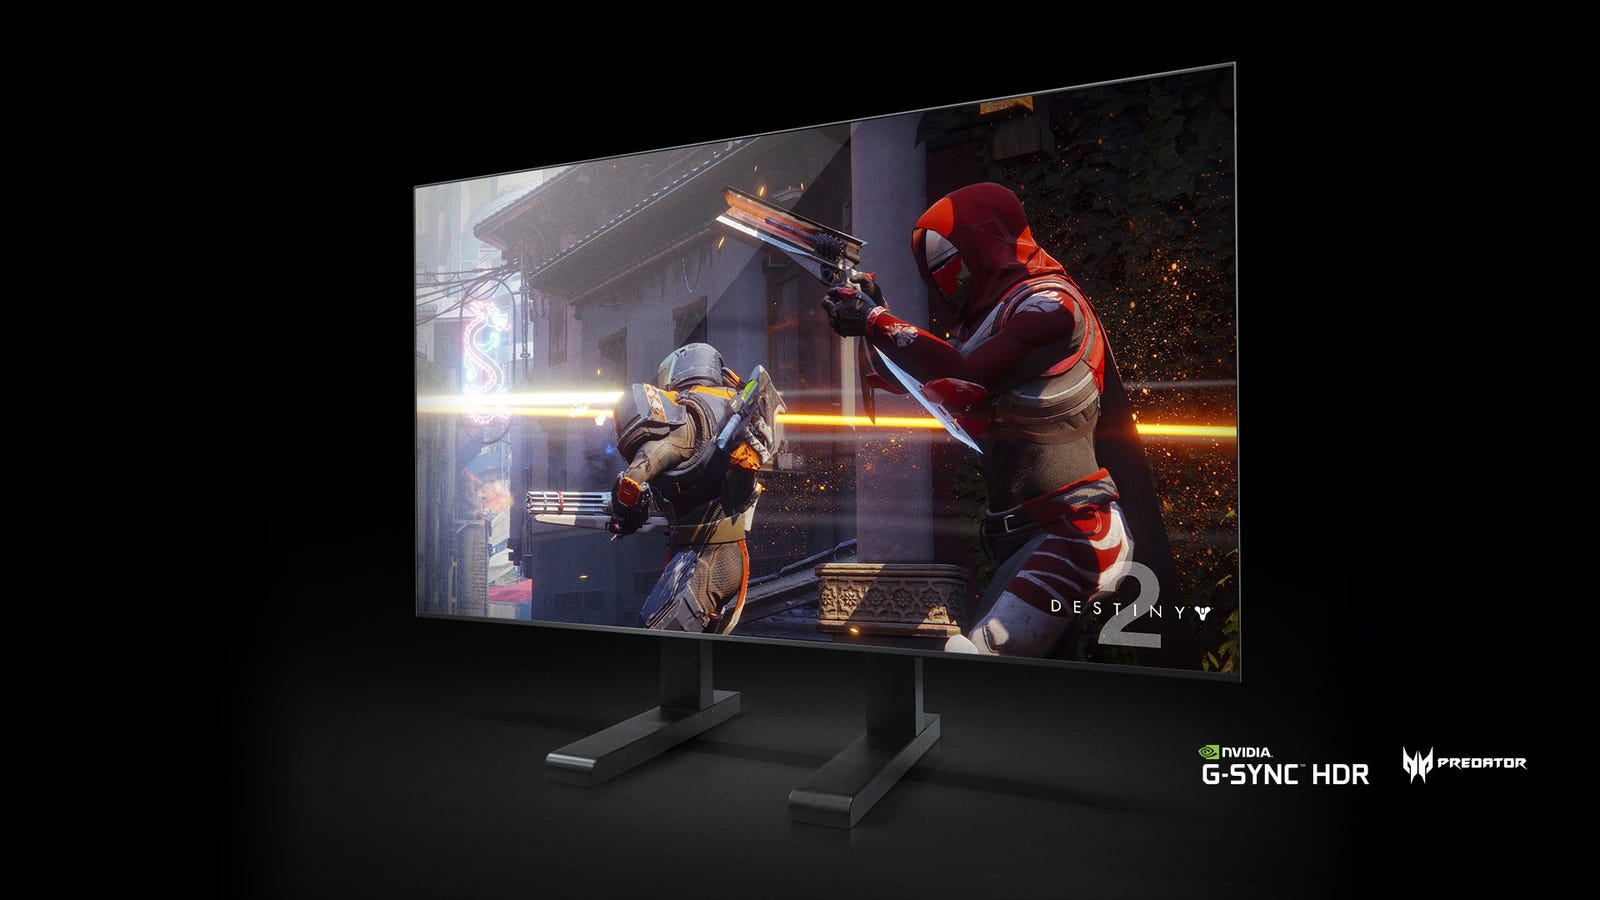 The Acer Predator BFGD. Image: Nvidia